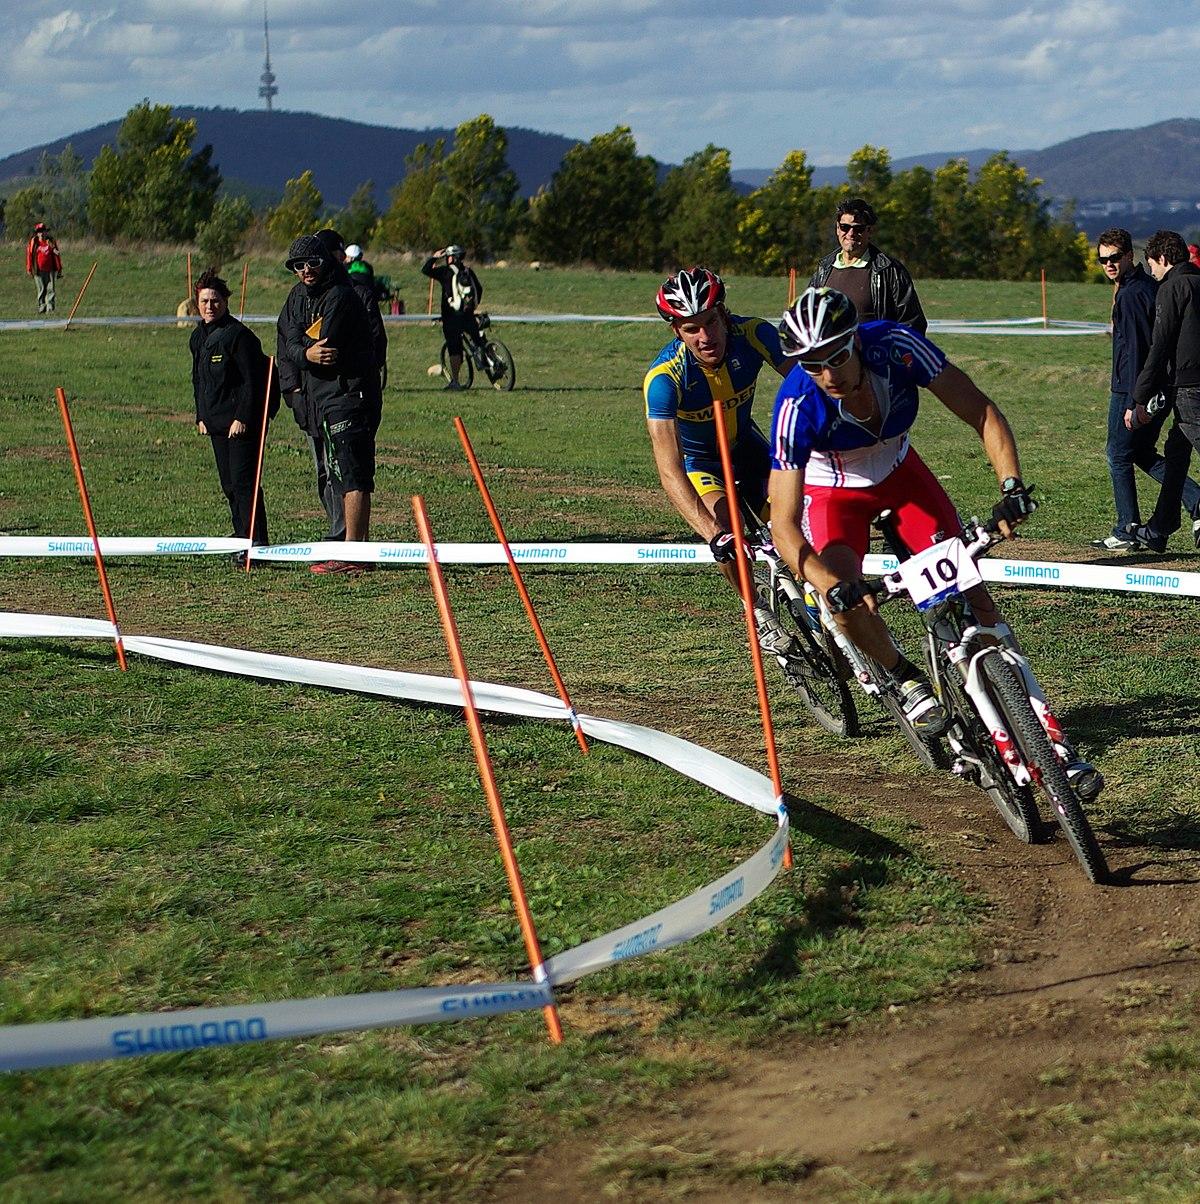 Circuito Xc : Cross country ciclismo wikipedia la enciclopedia libre